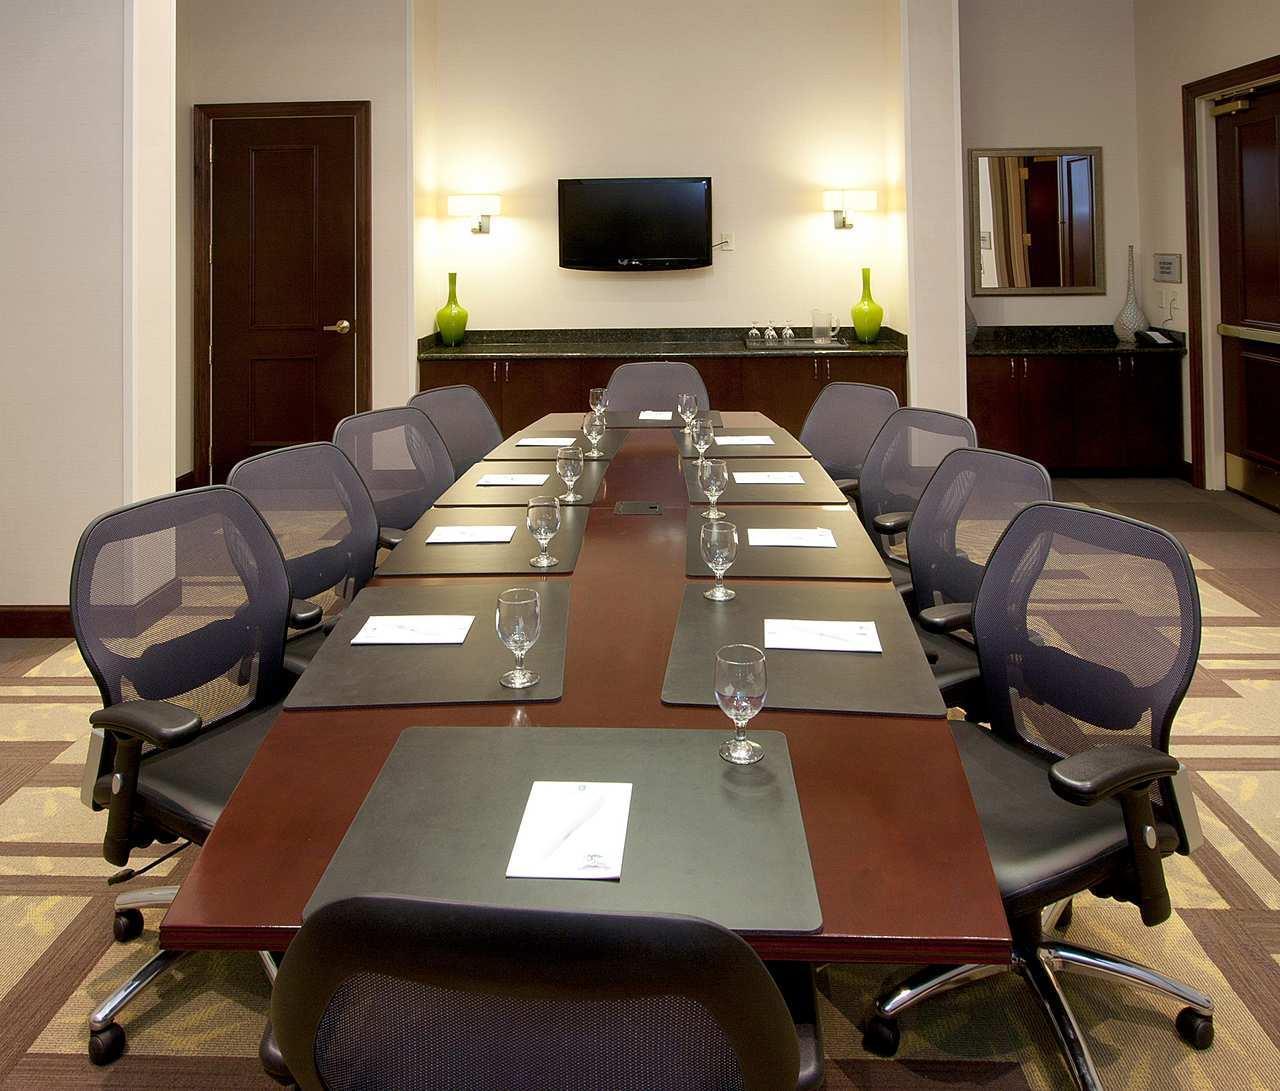 Embassy Suites by Hilton Savannah Airport image 13